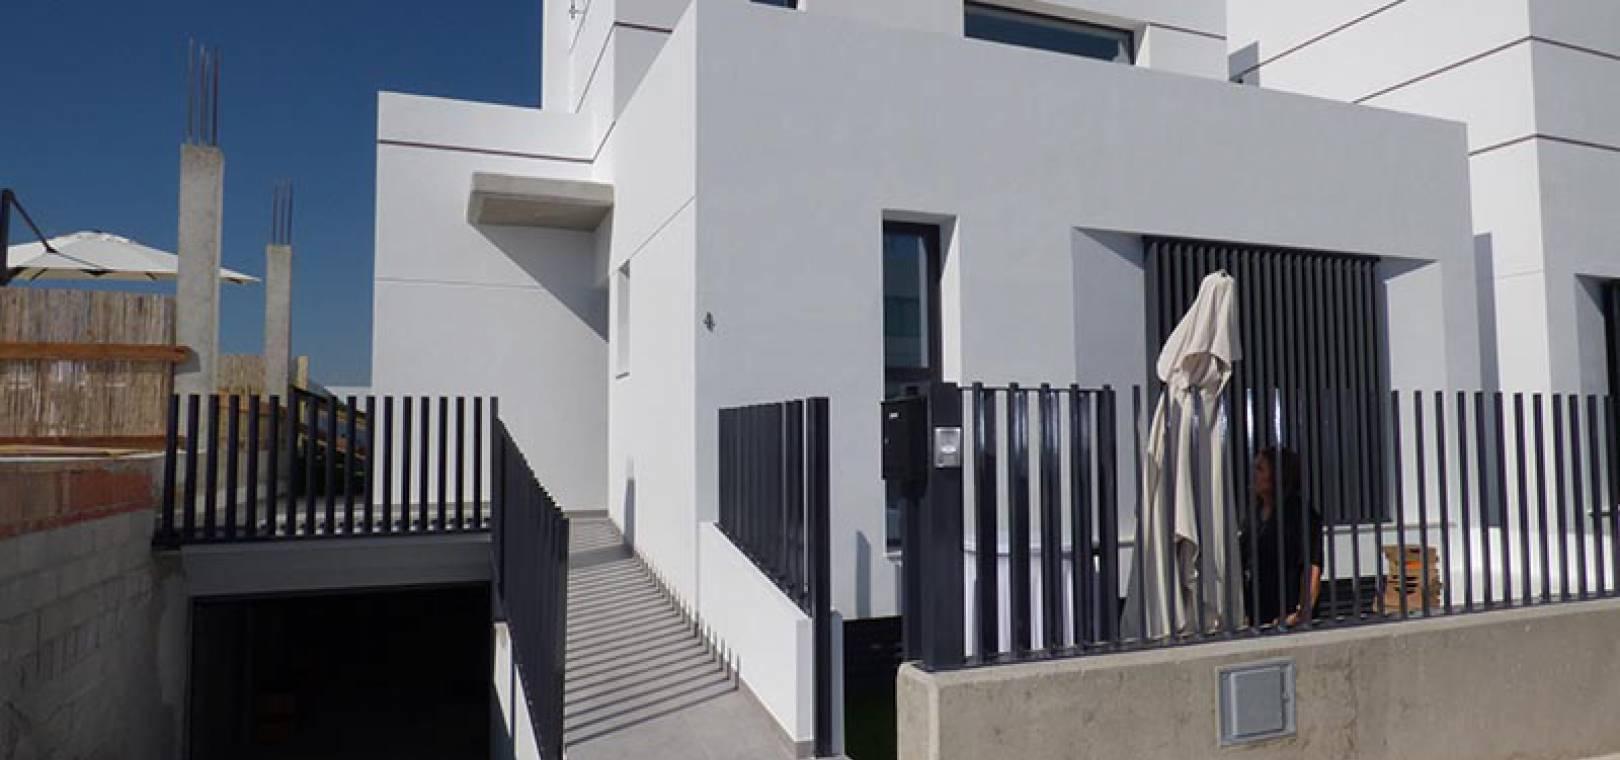 Nieuw gebouw - Villa - Daya Vieja